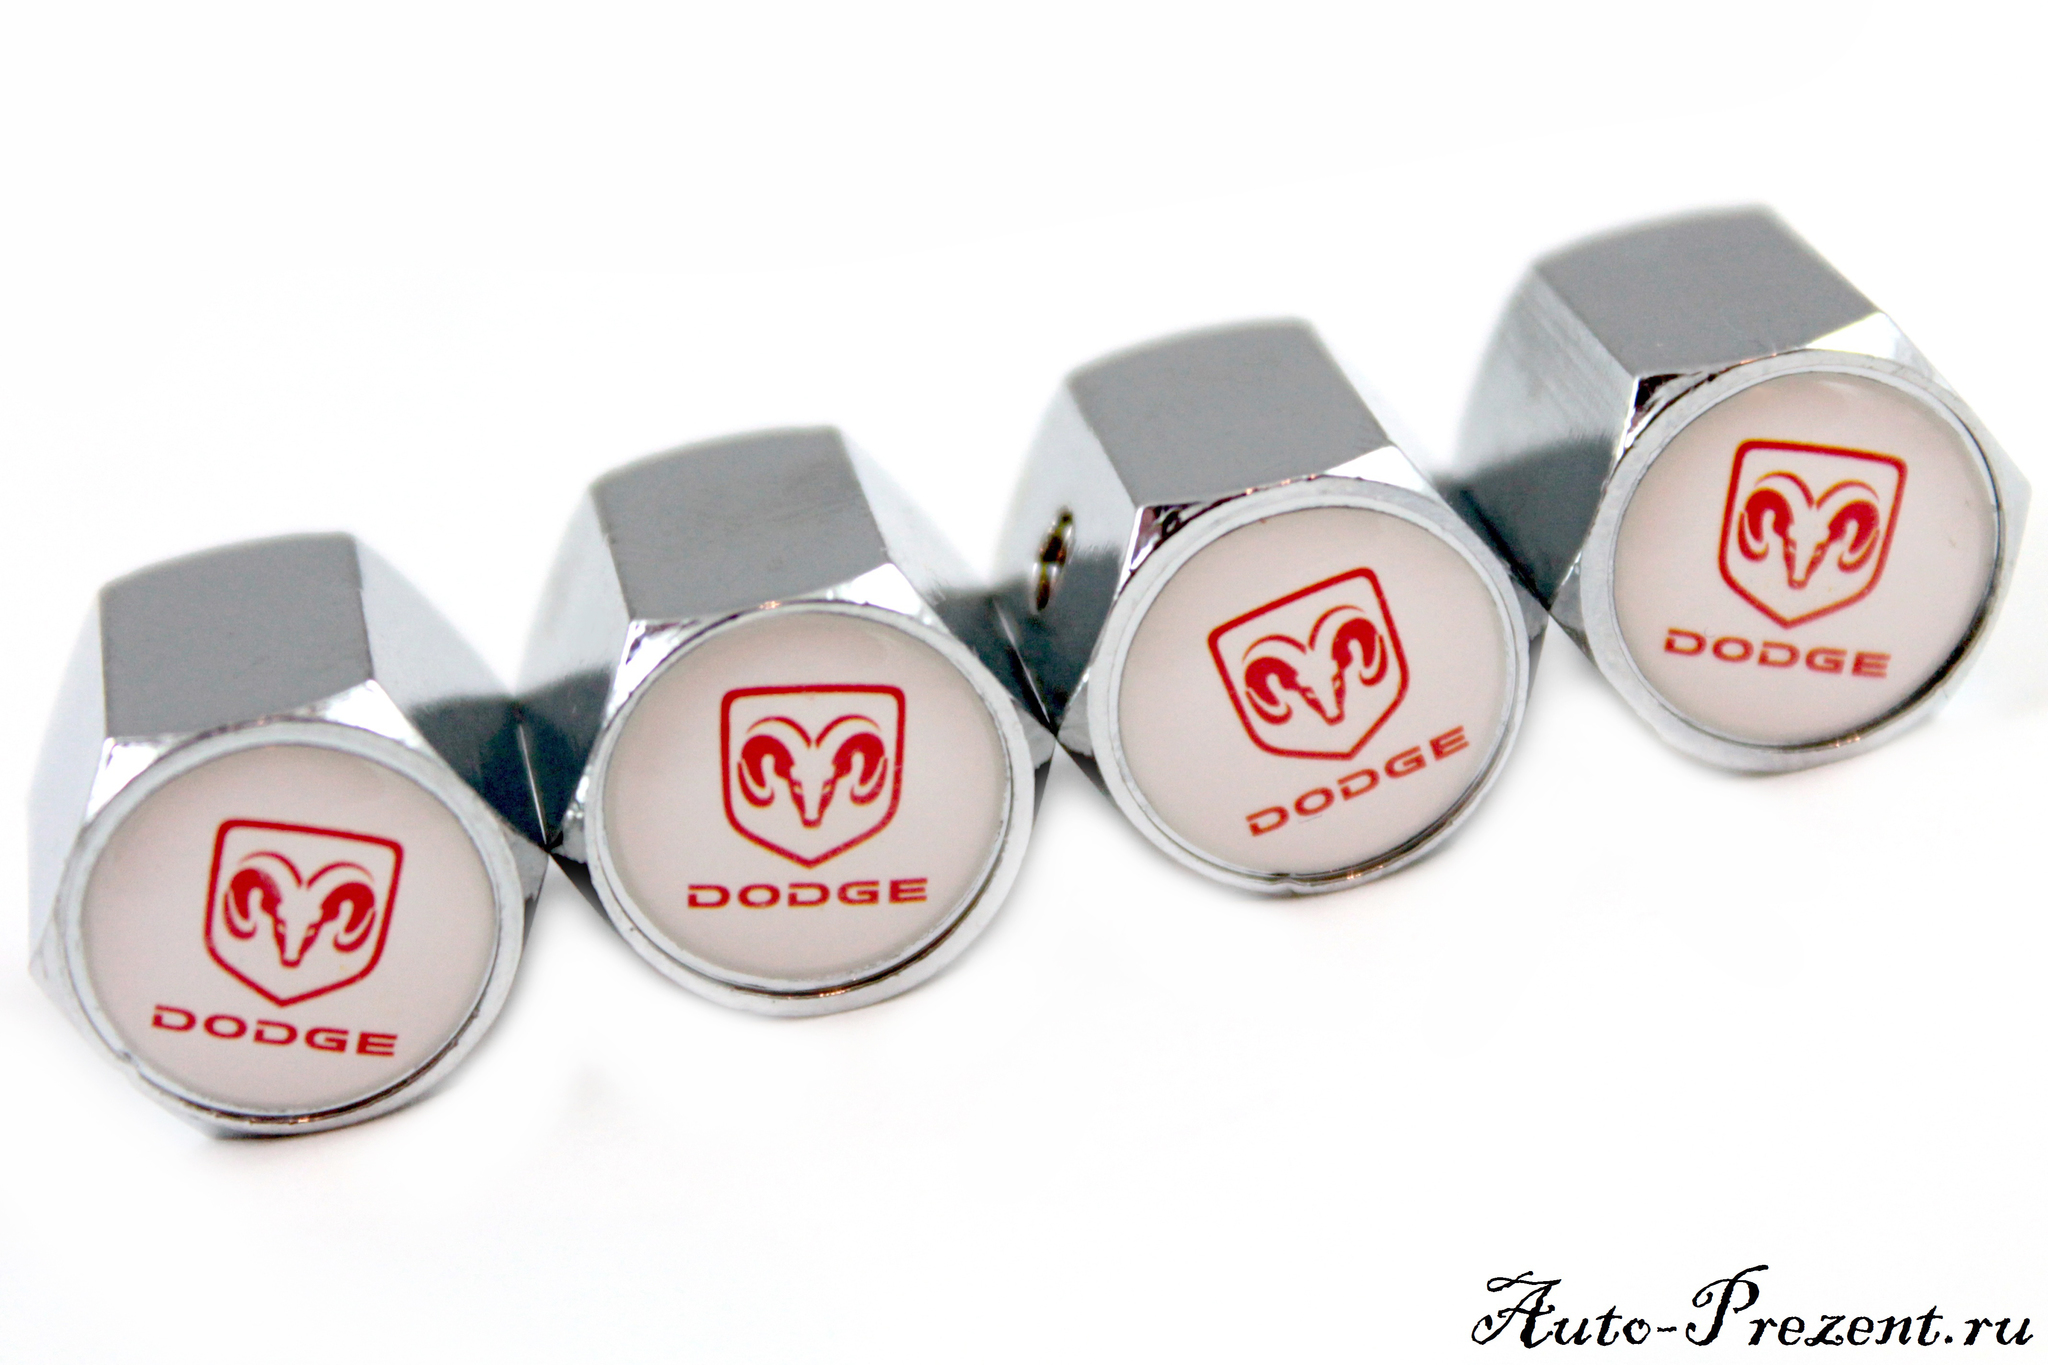 Колпачки на ниппель DODGE с защитой от кражи